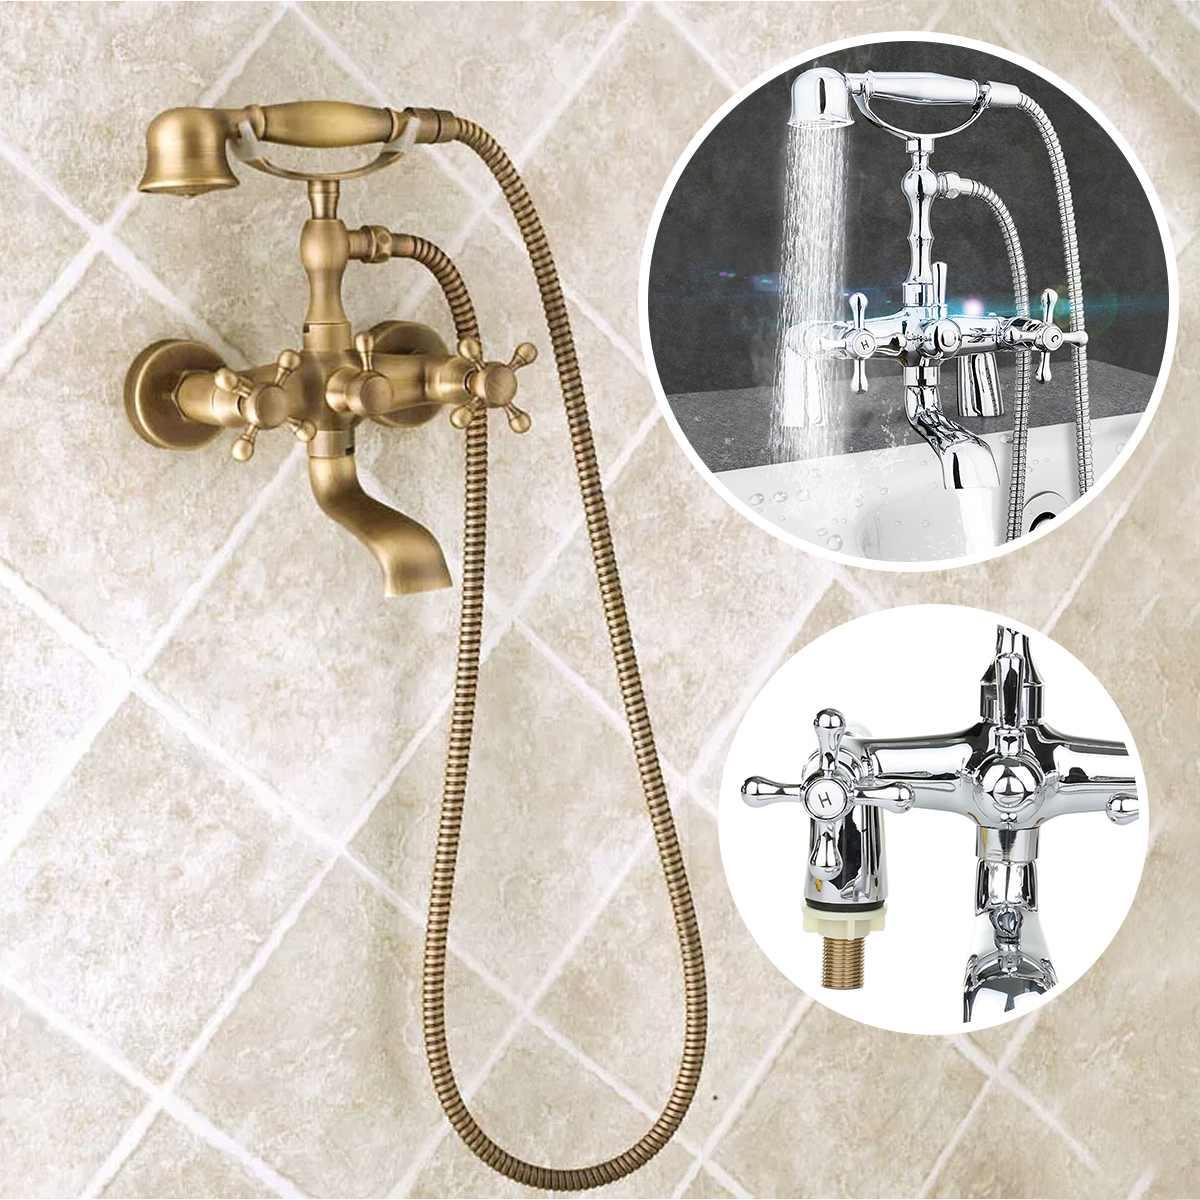 Antique Phone Shape Bathroom Bath Tub Shower Set Solid Brass Water Faucet Shower Head Hand Sprayer 1.5m Hose Bath Mixer Tap Kits